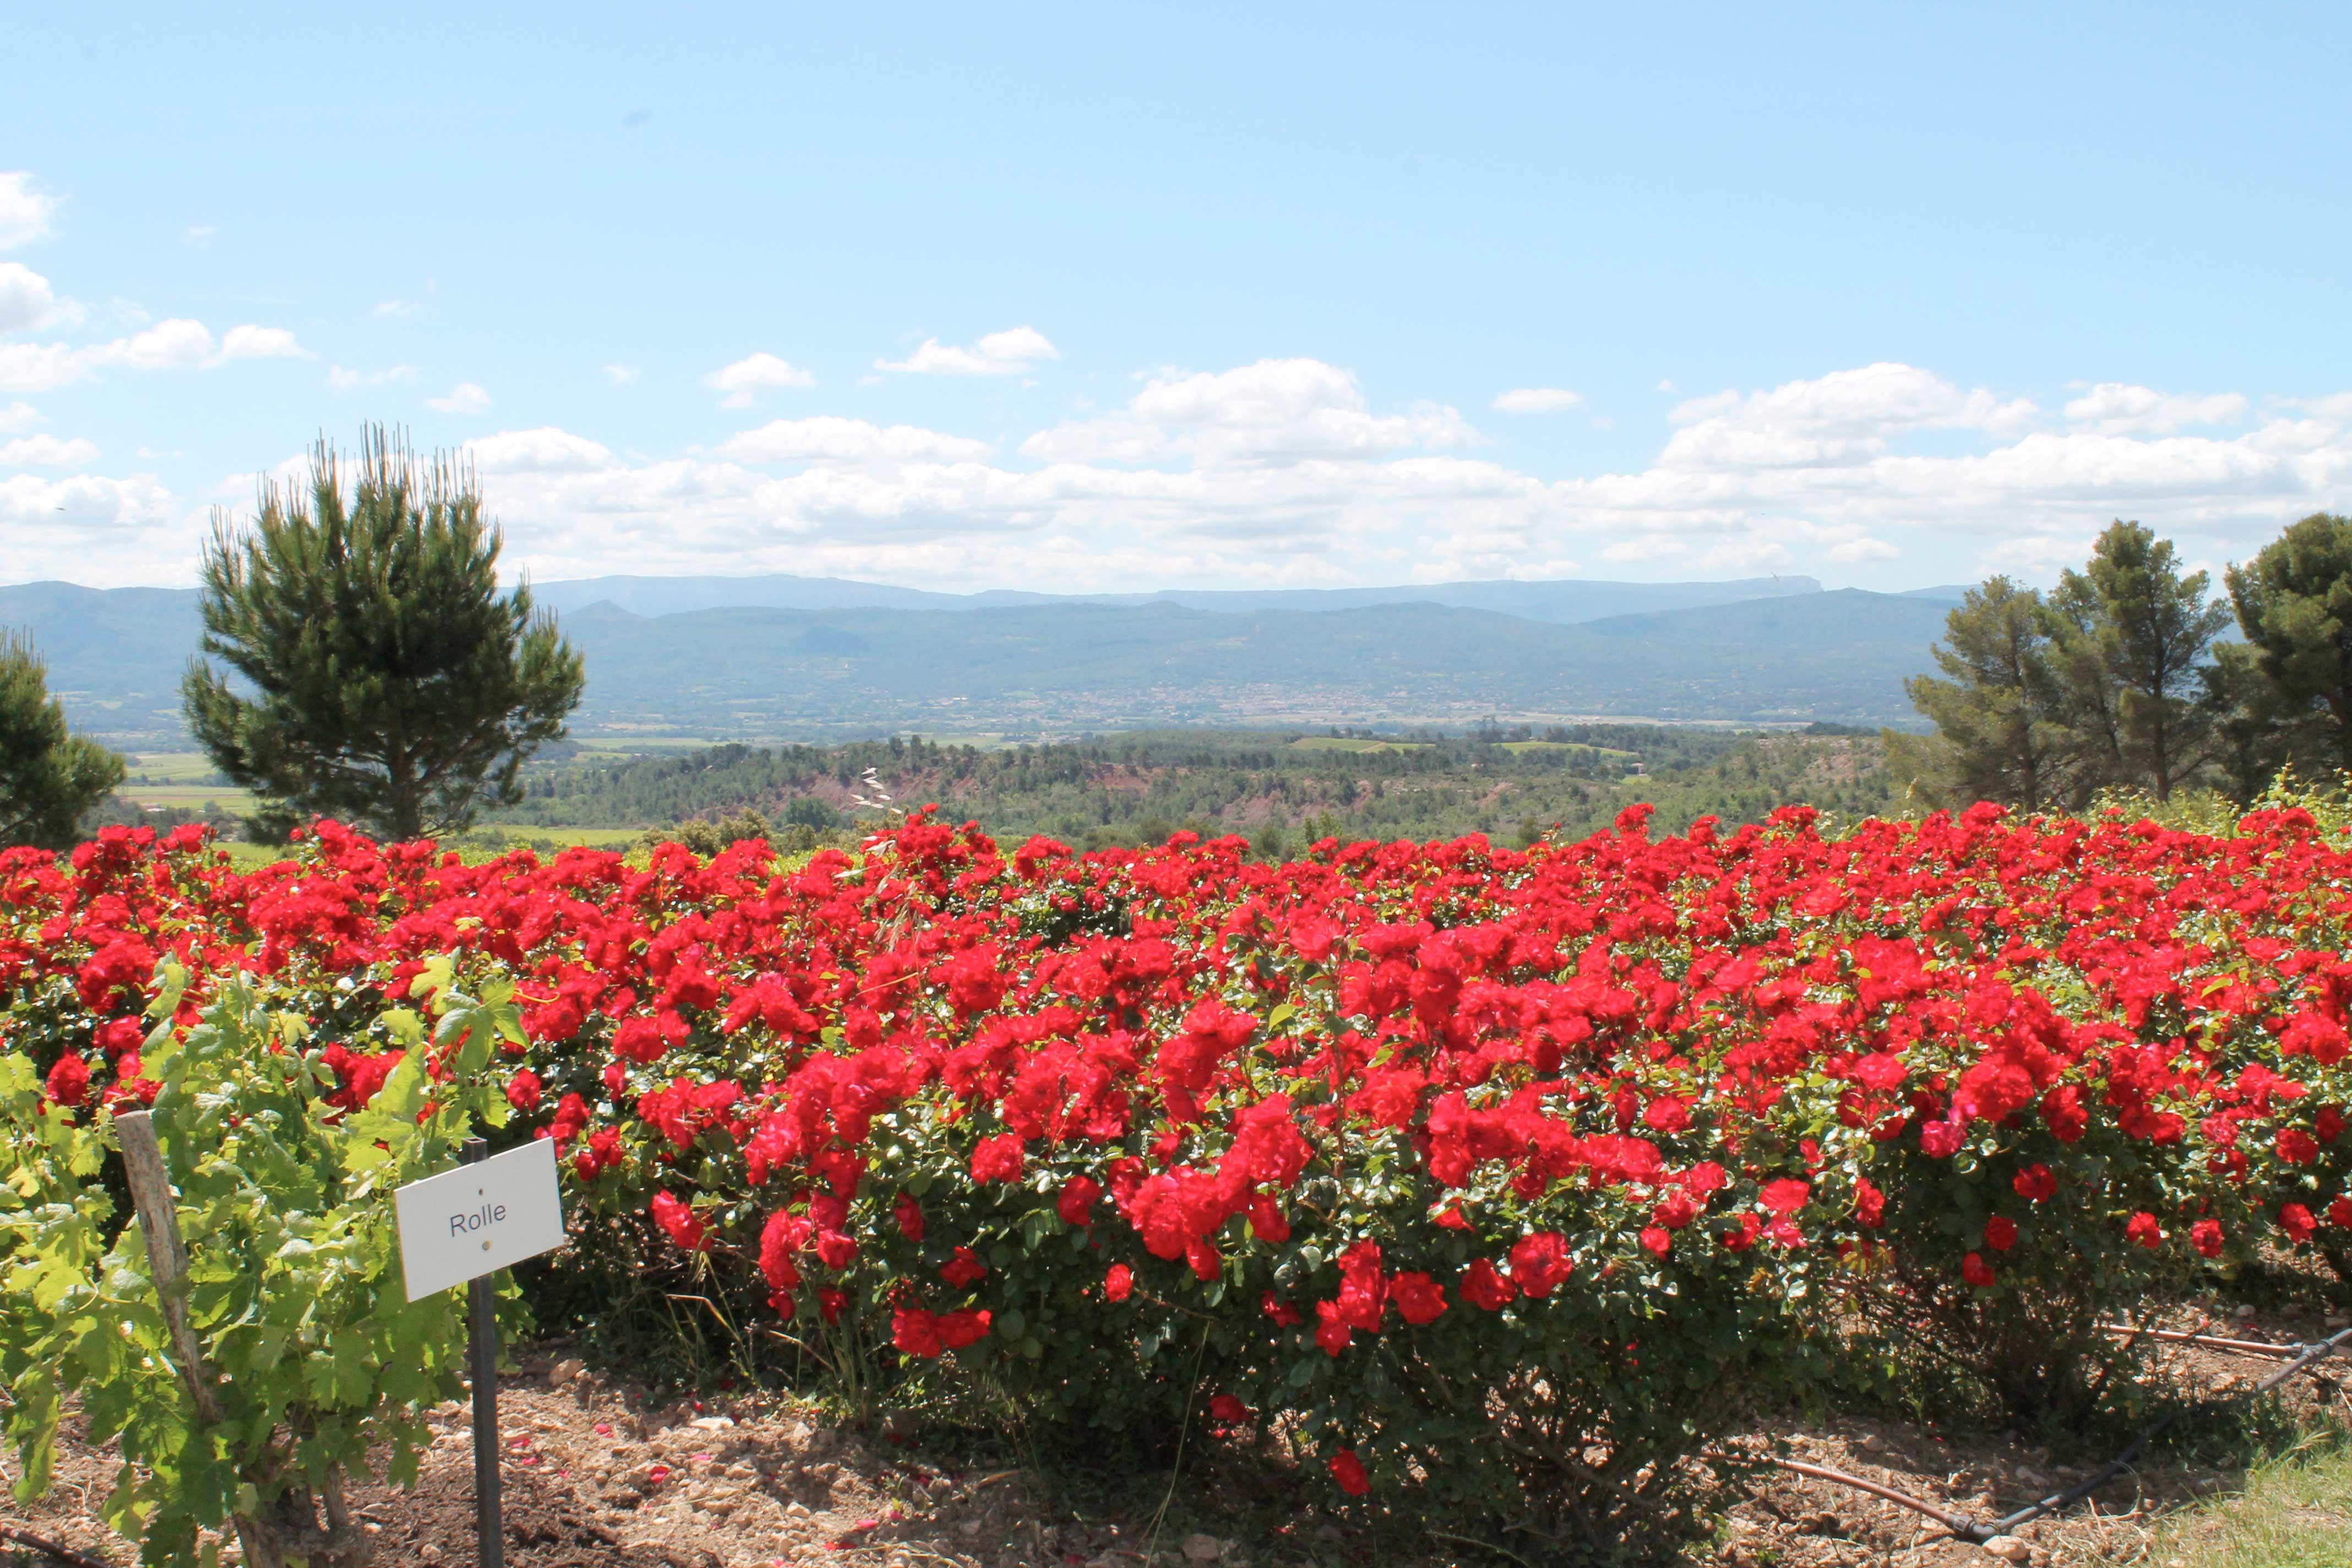 Aix en Provence wine tour, flowers near vineyard